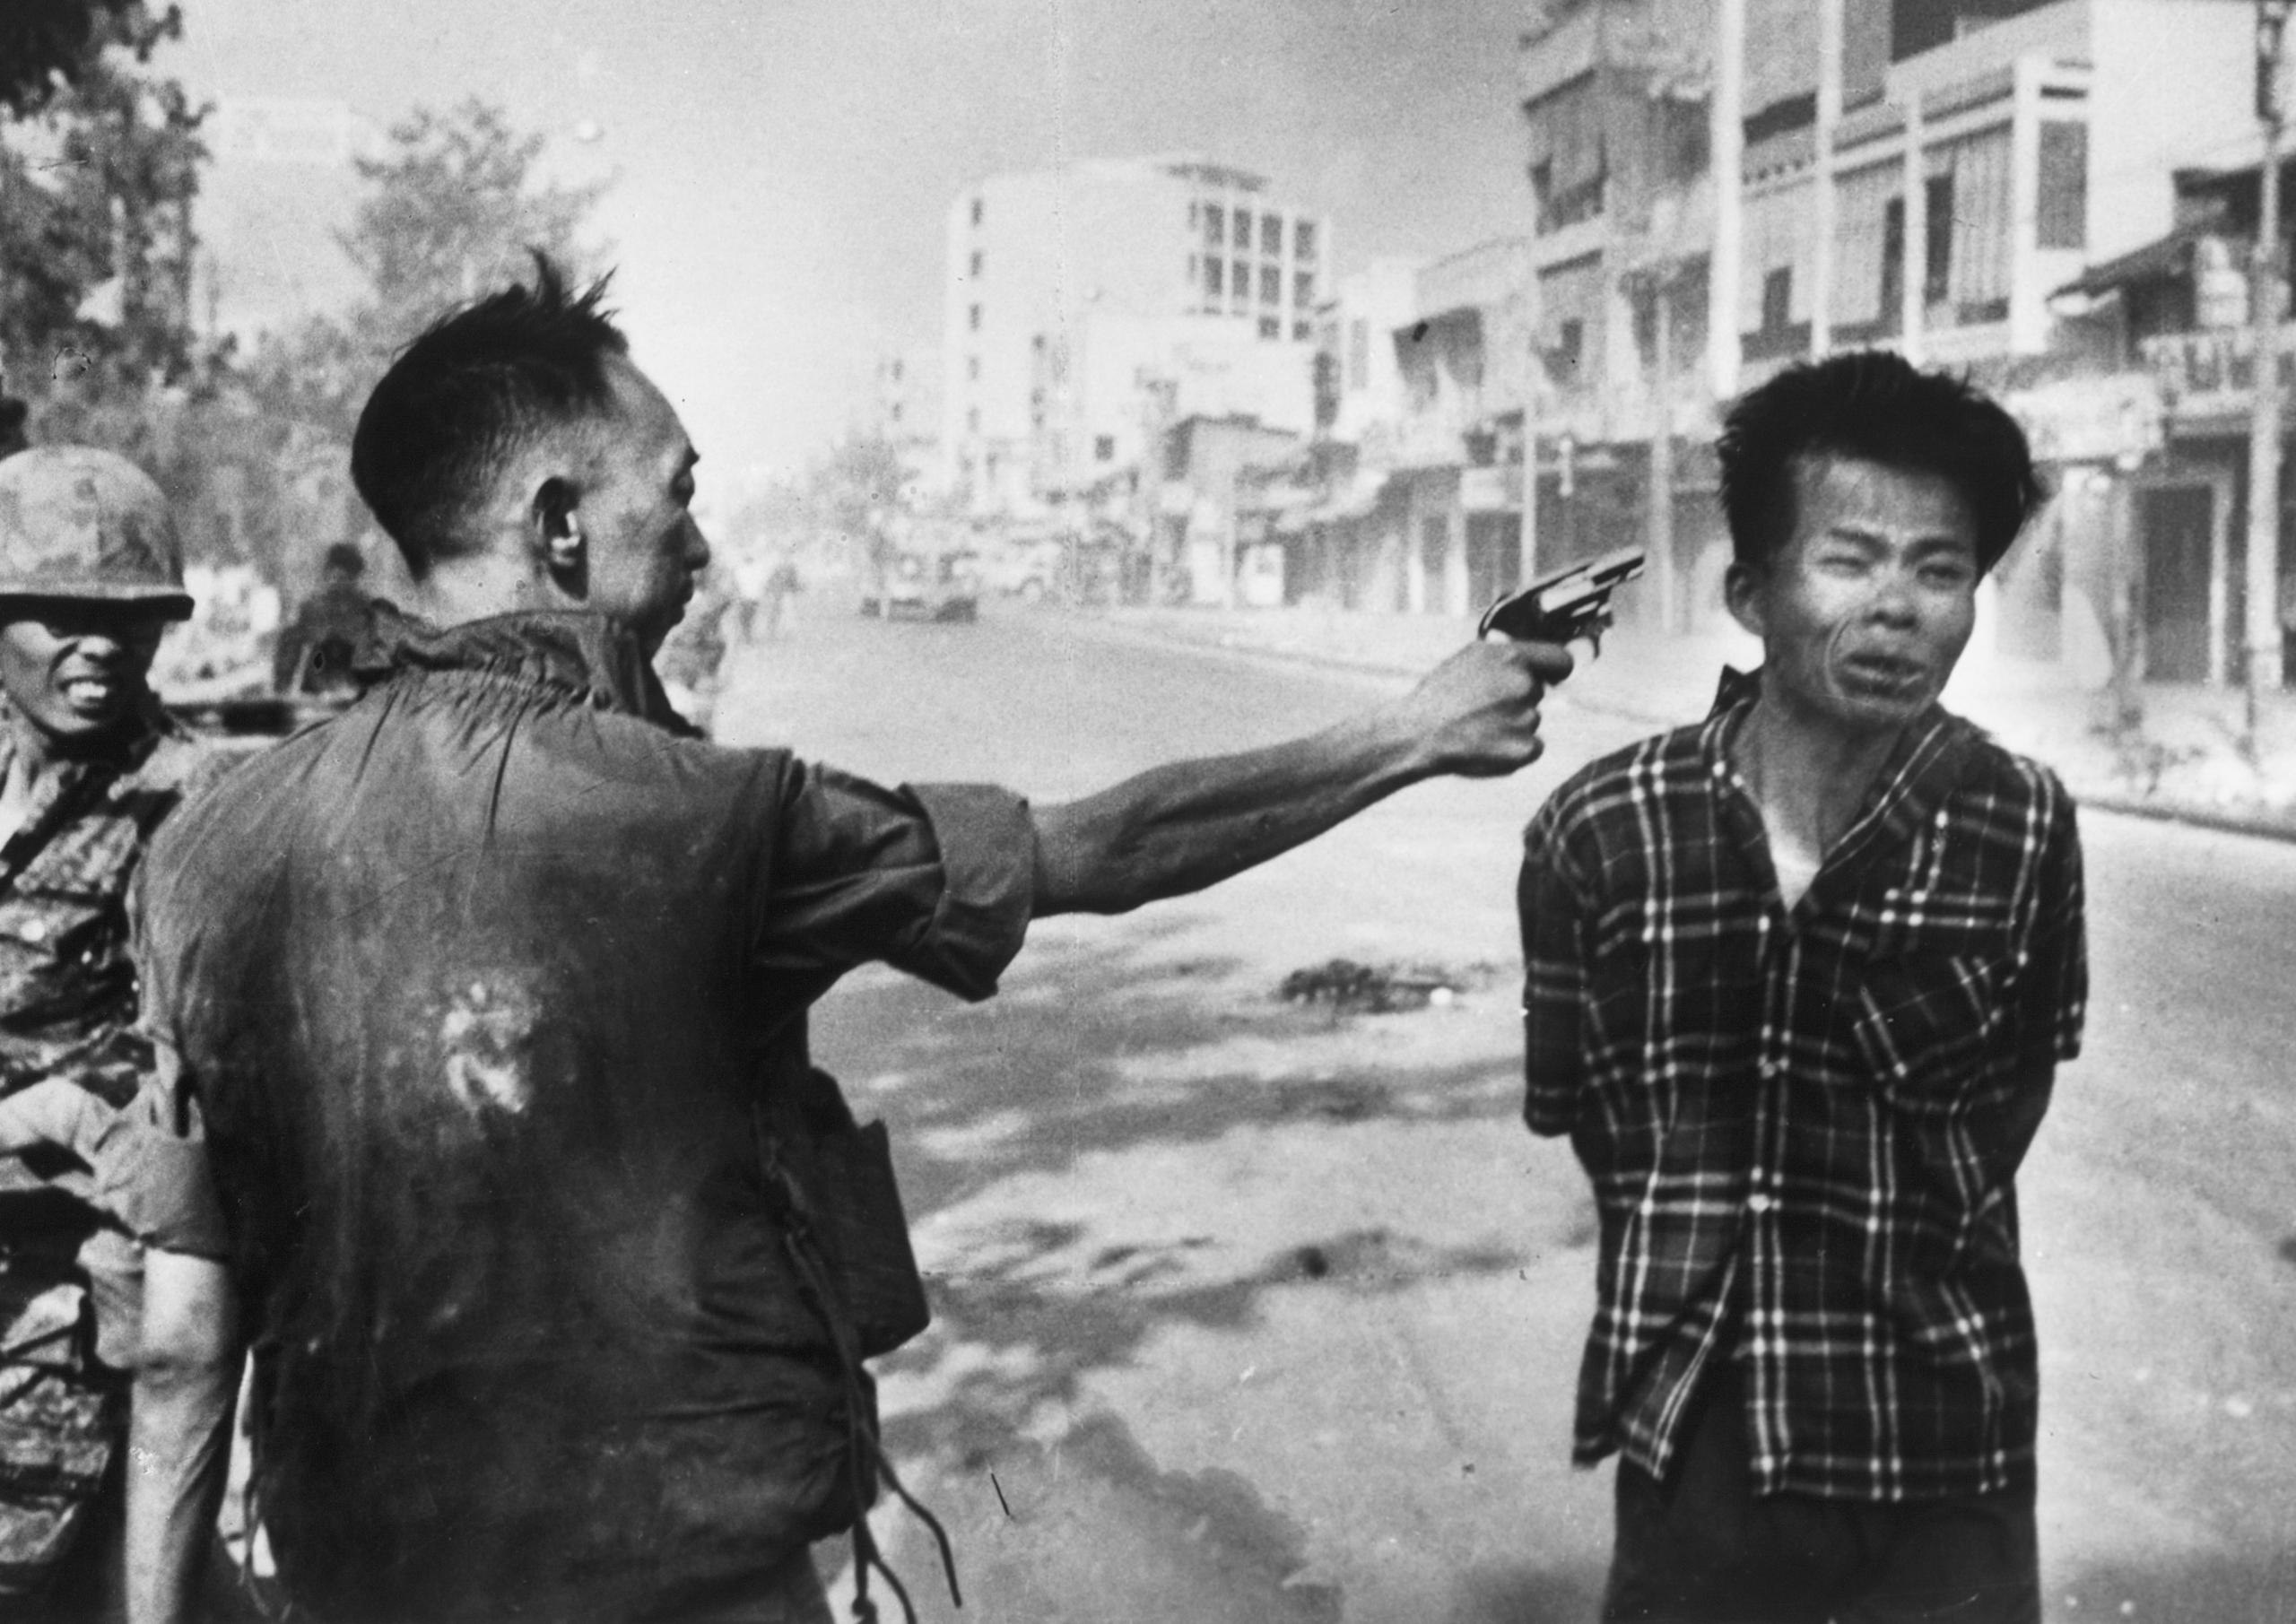 Police Chief Nguyen Ngoc Loan executes suspected Viet Cong member Nguyen Van Lem